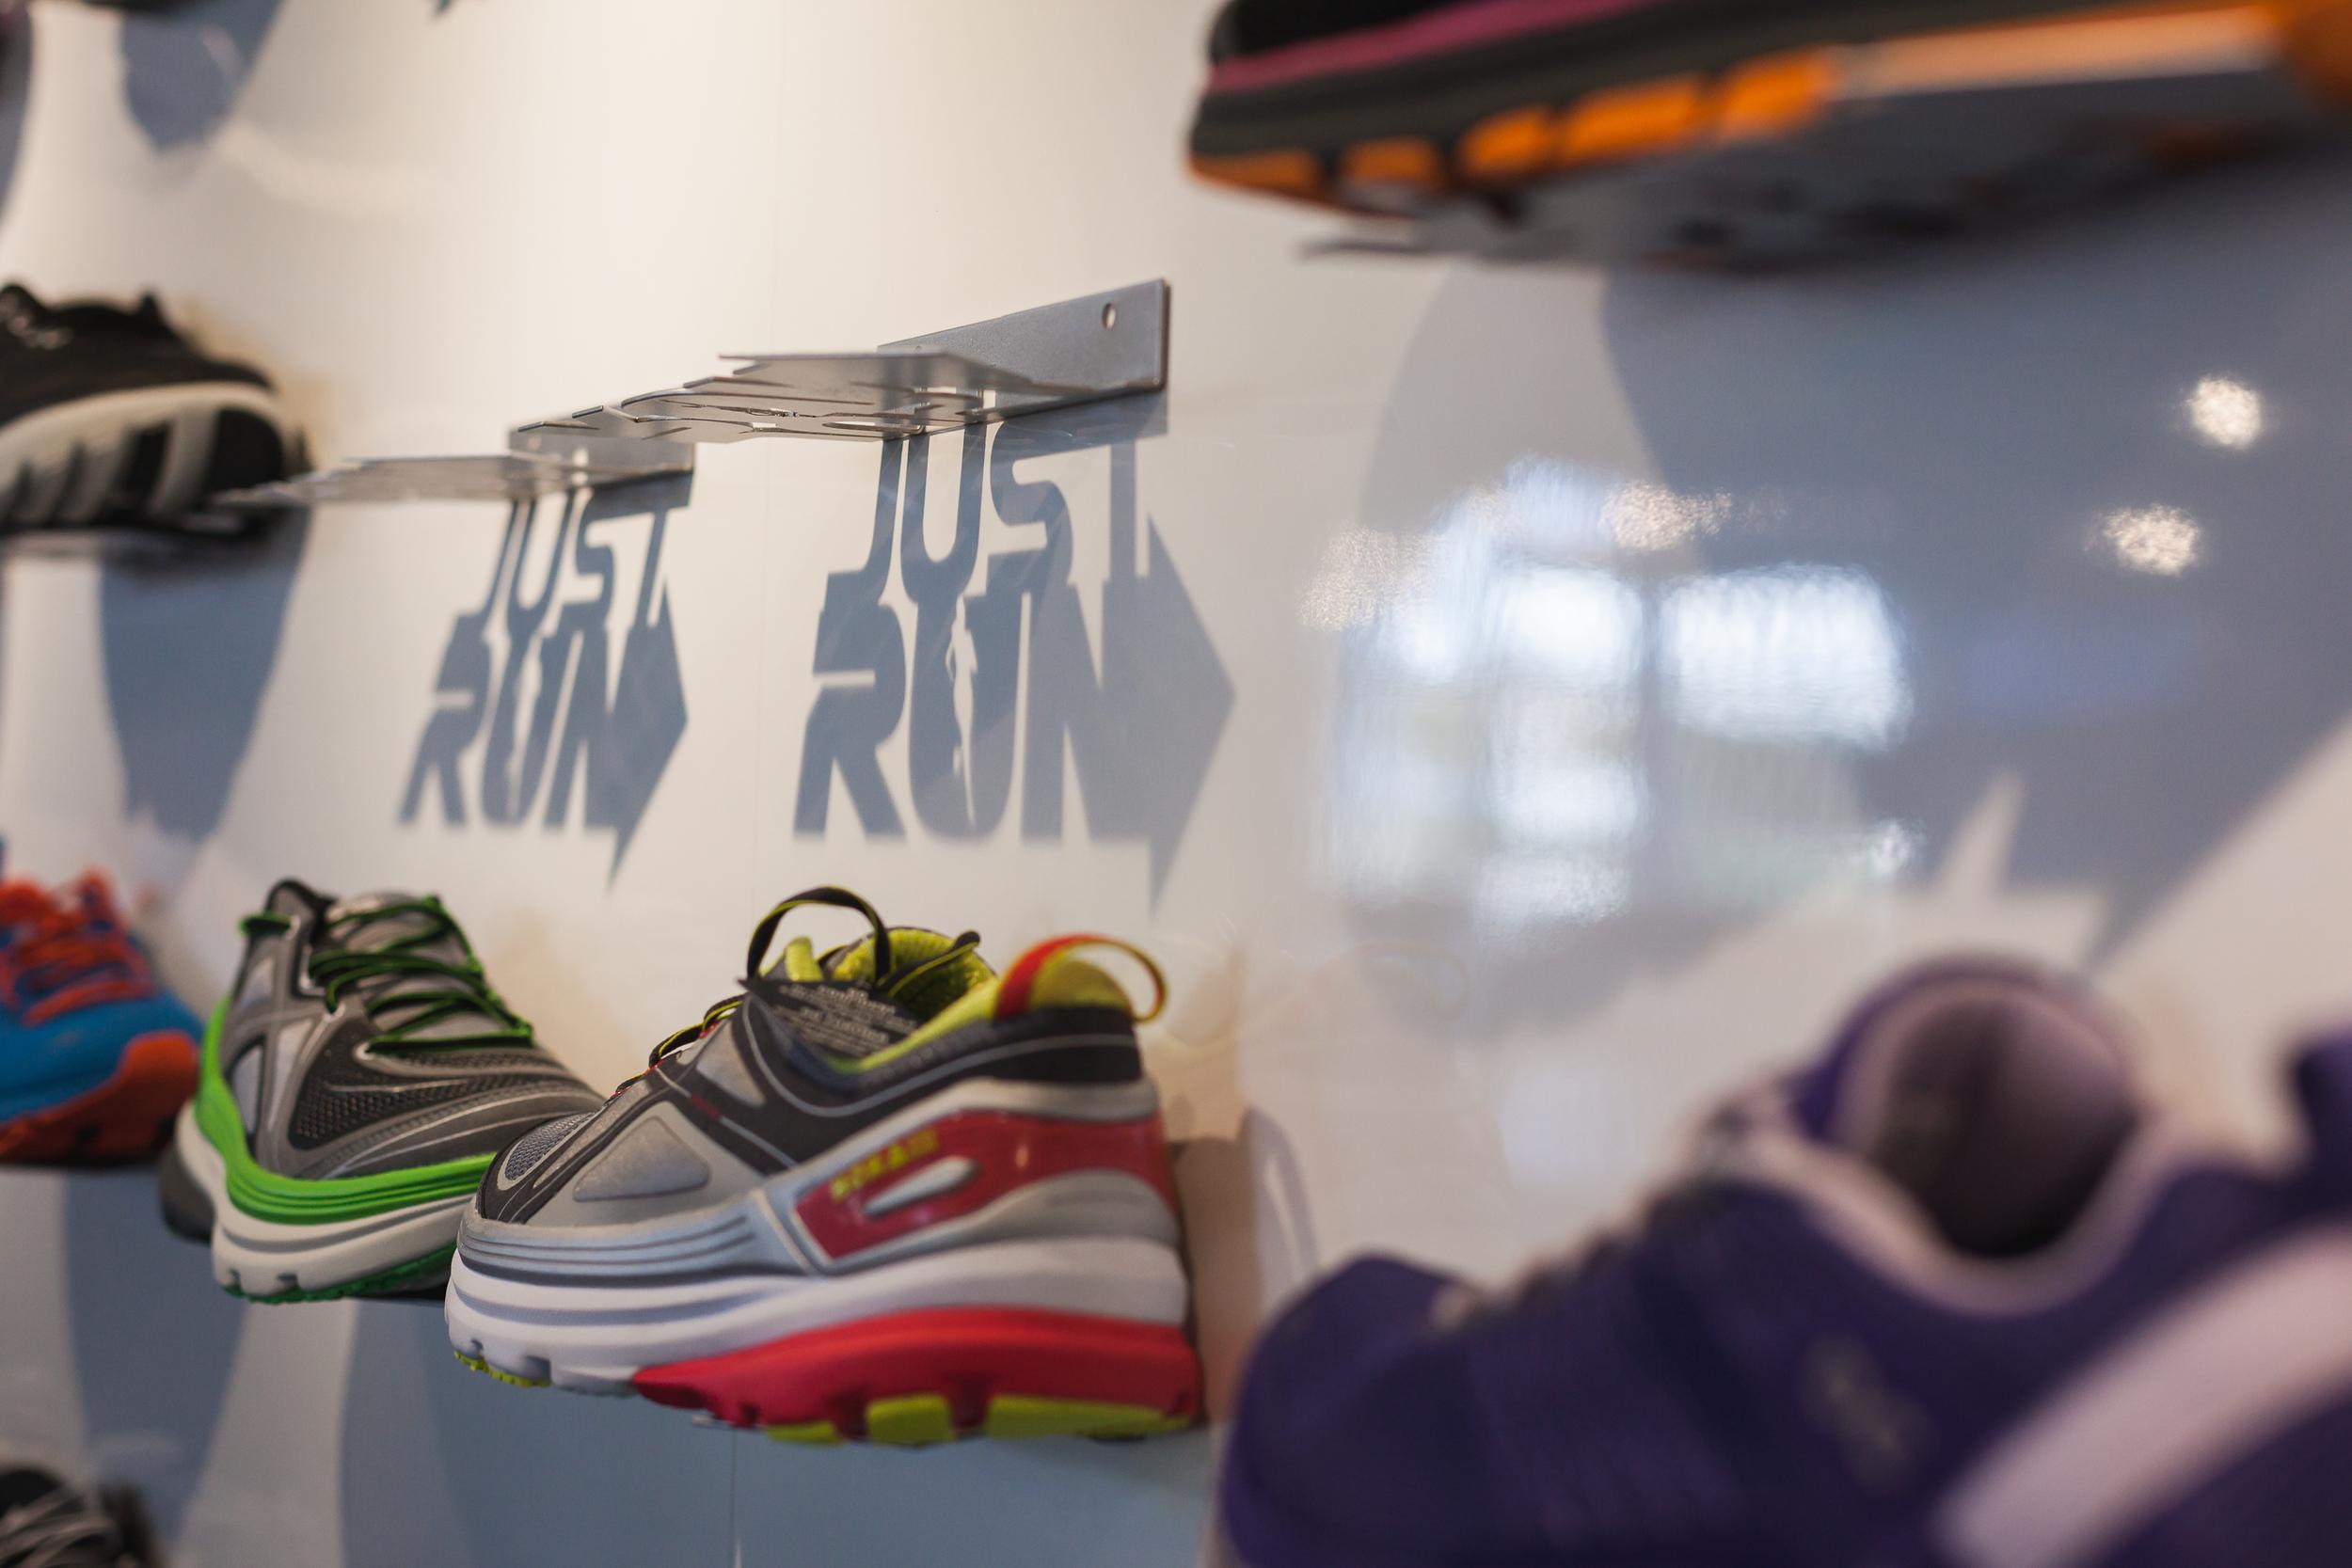 Just Run_Shoe Wall_03.jpg